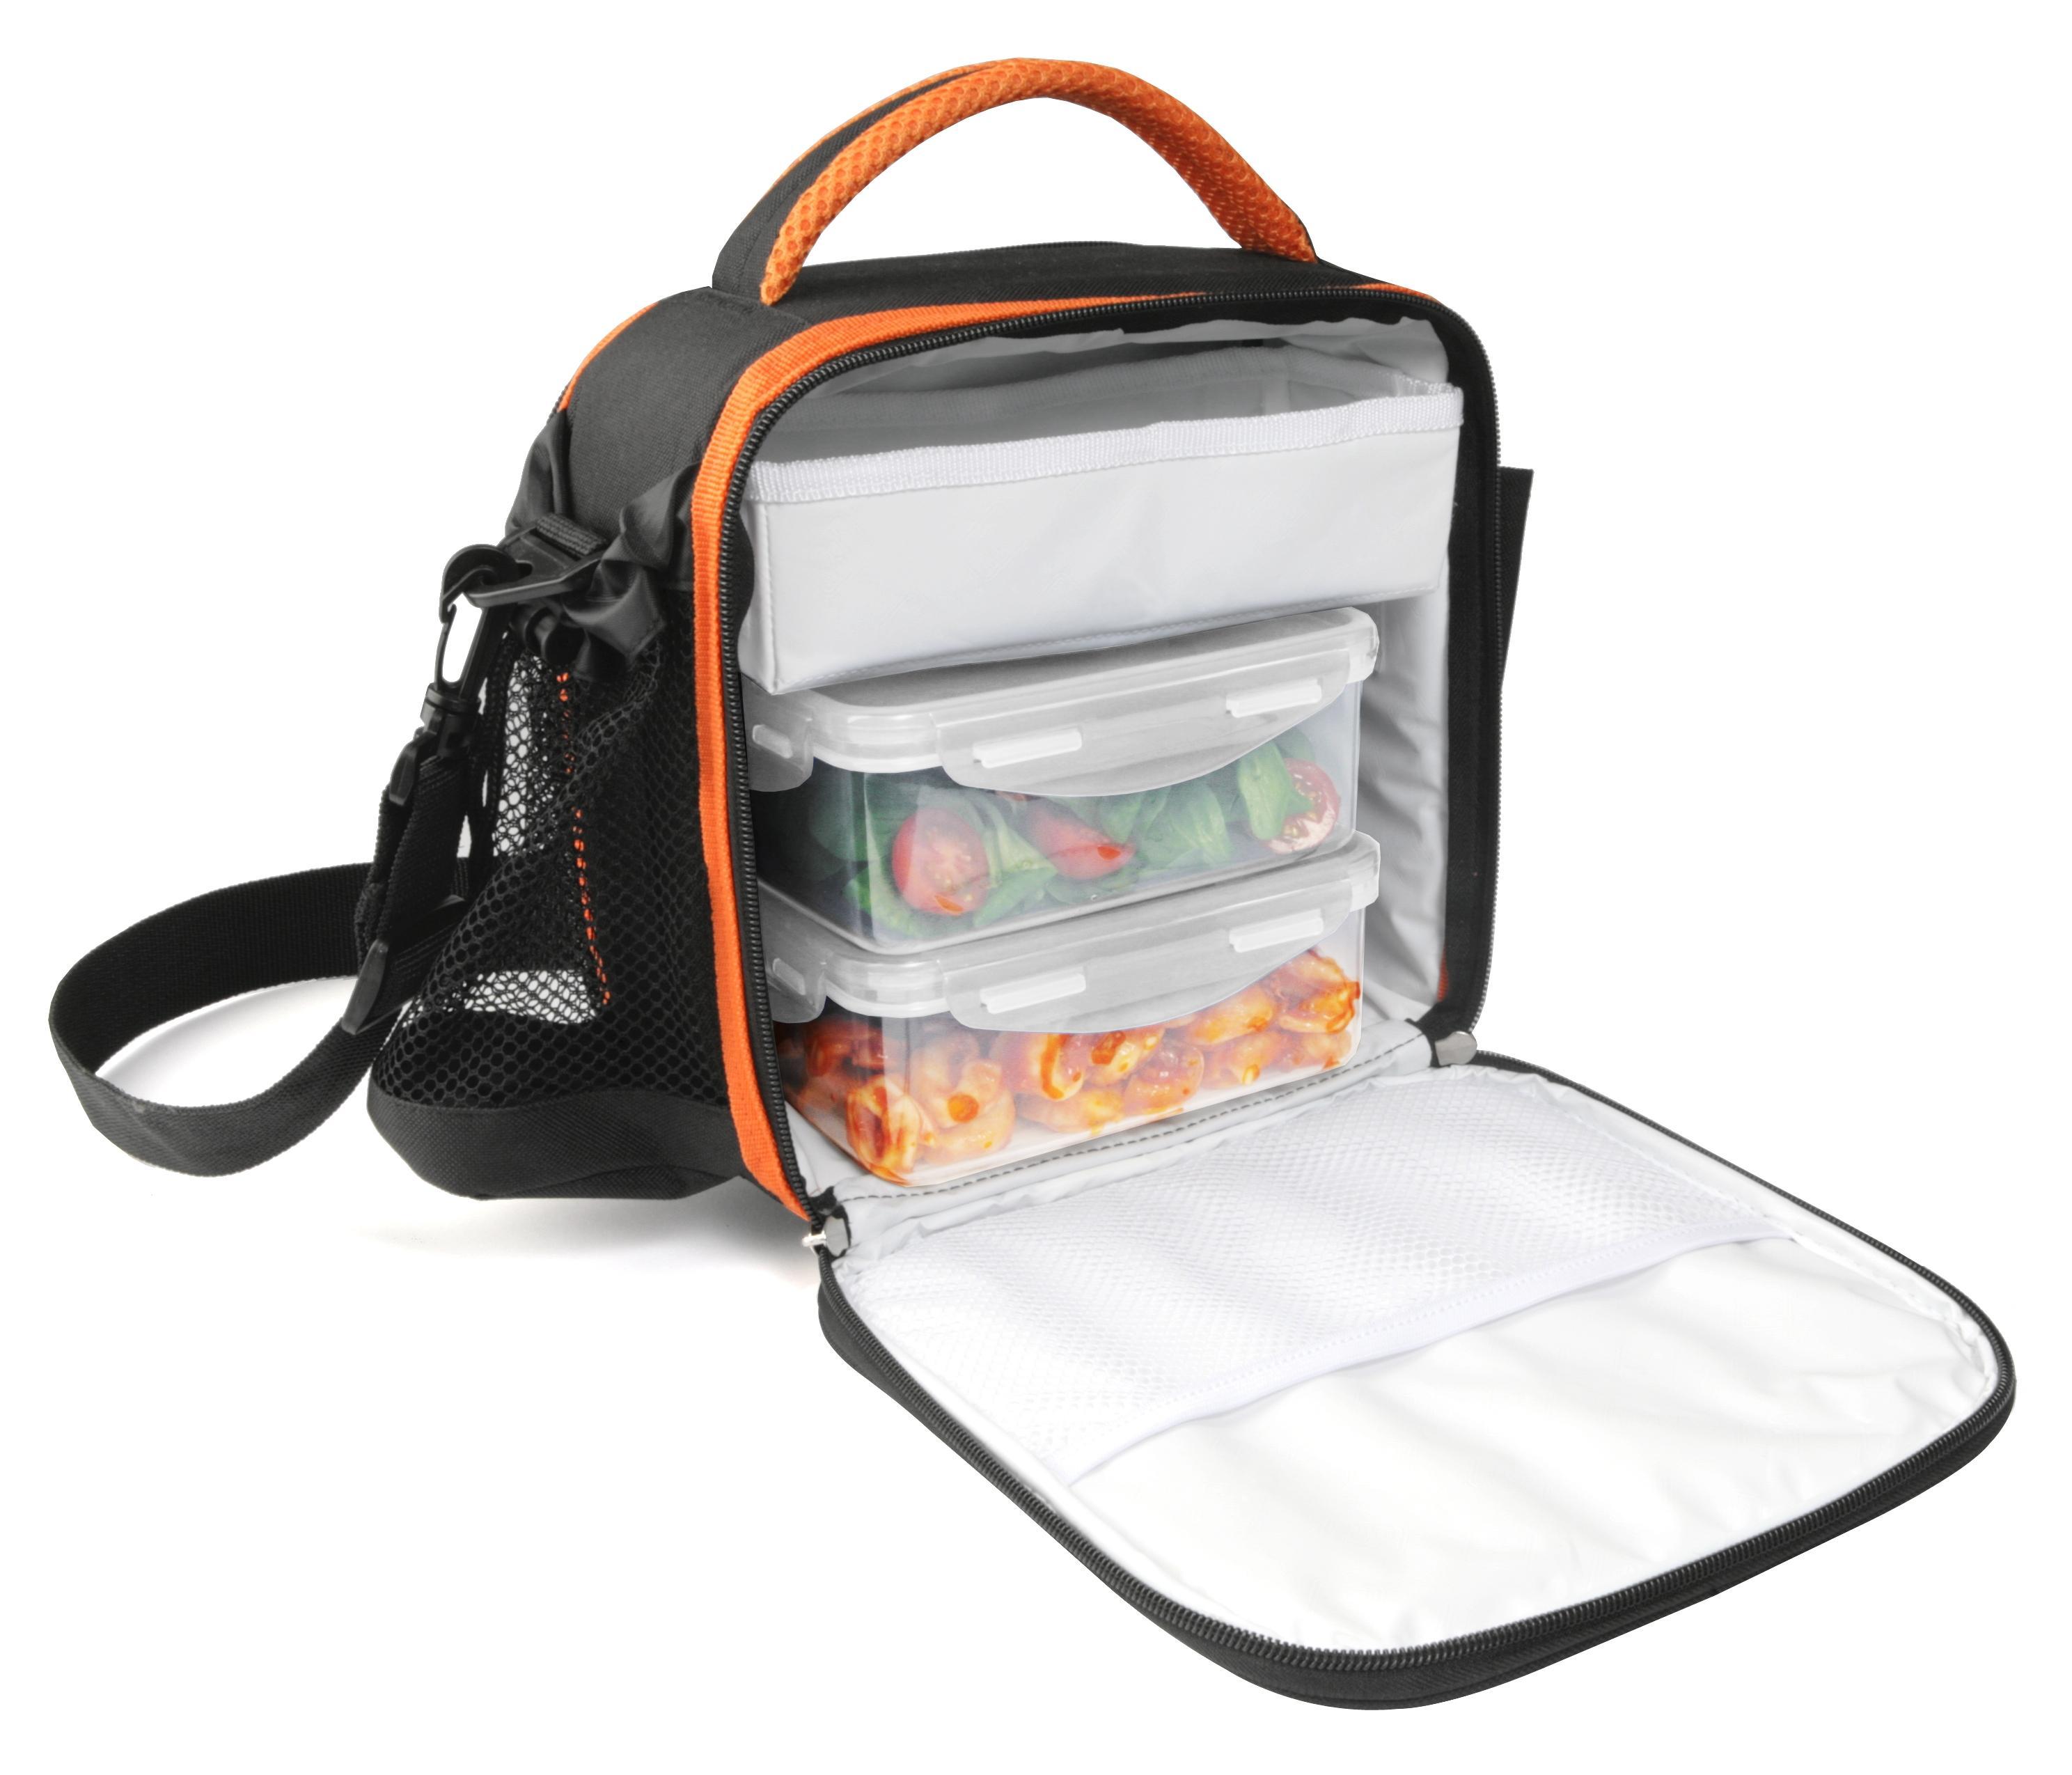 Bolsa isotermica para llevar insulina : Foto bolsa isotermica monix portalimentos yuppie